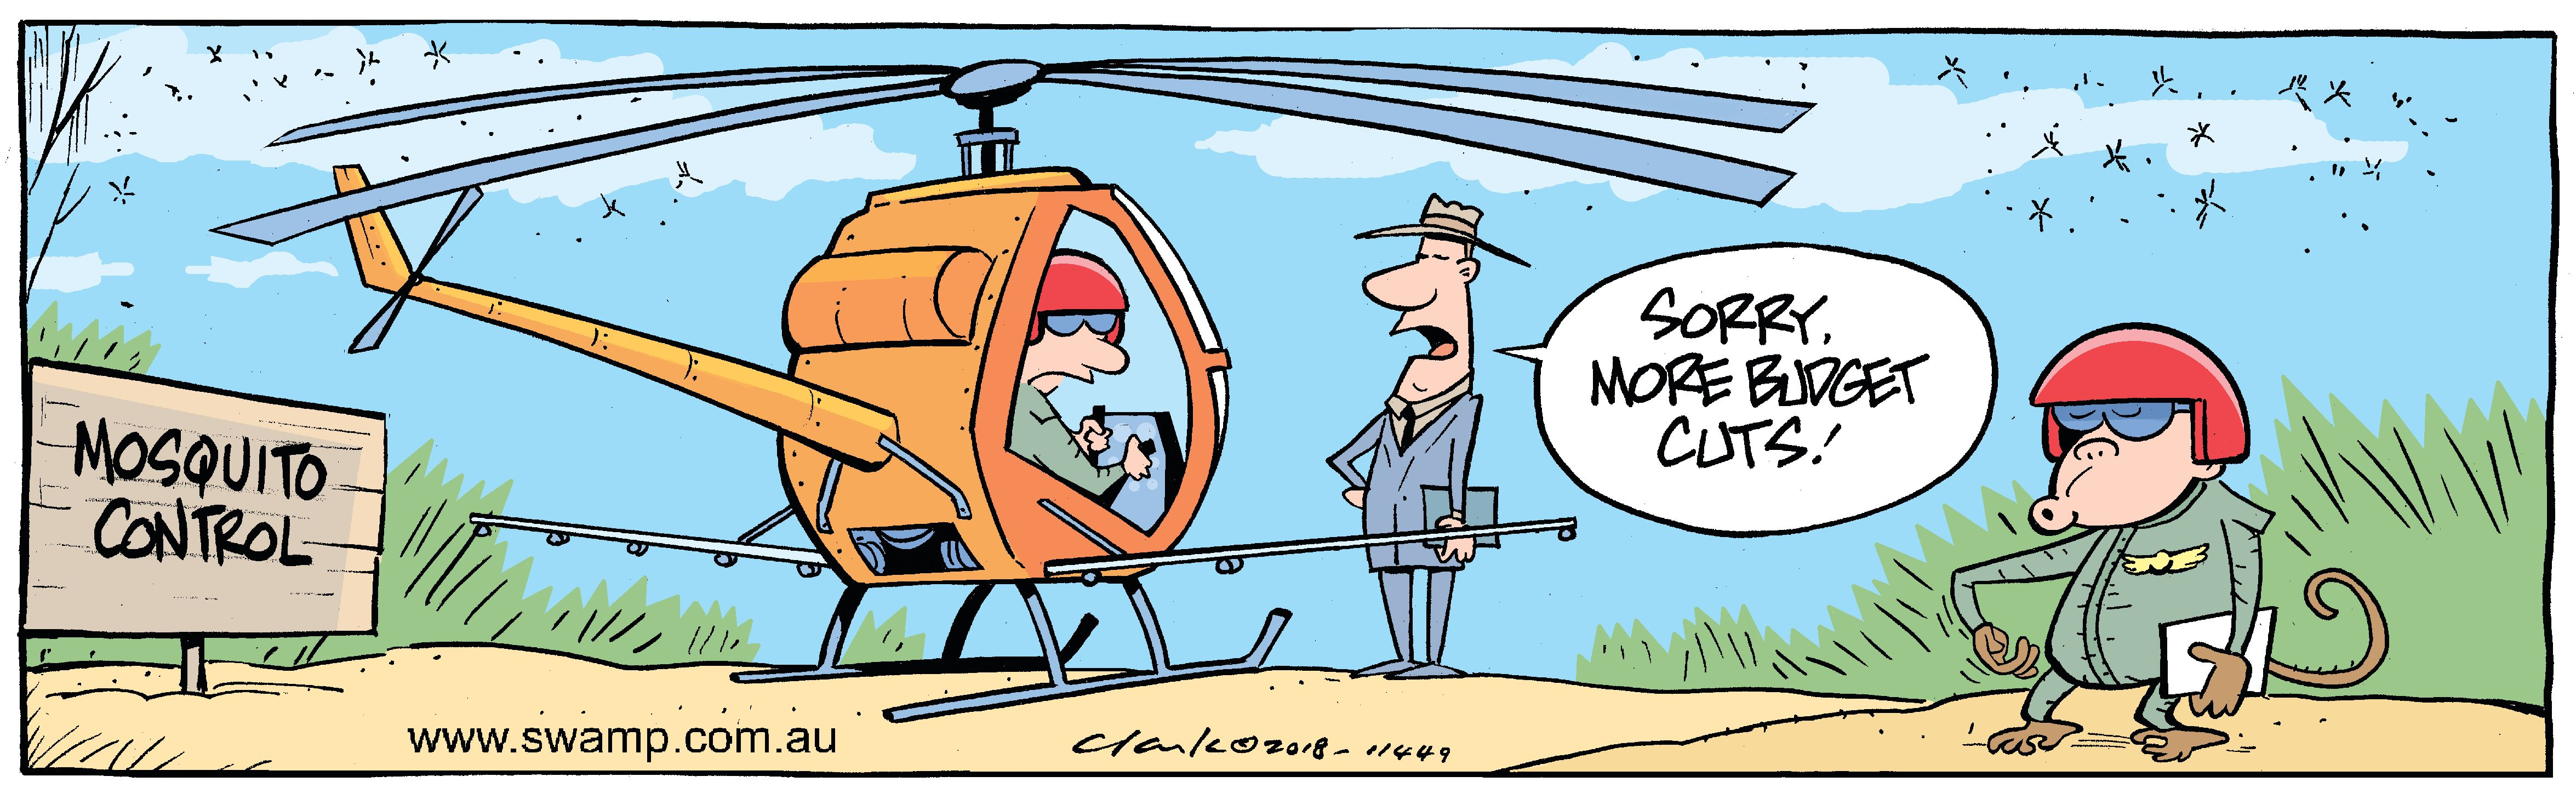 Mosquito Control Budget Cuts